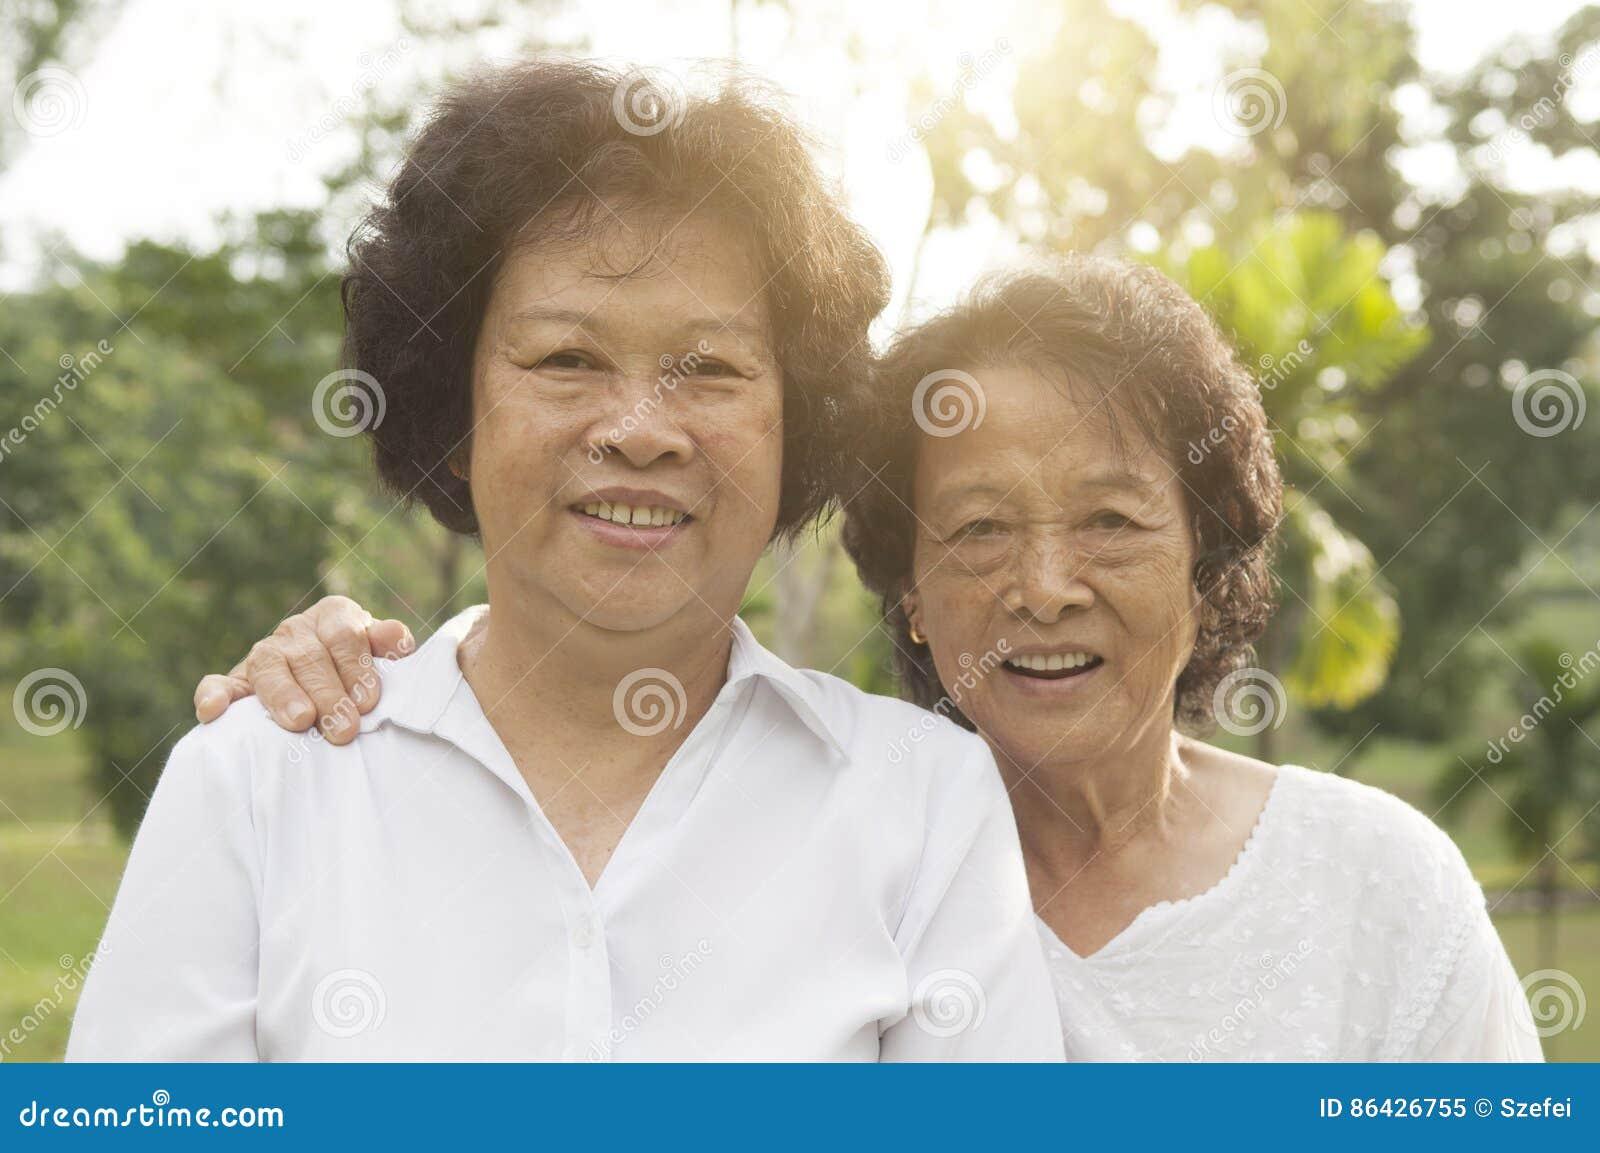 Asian seniors family at outdoor park